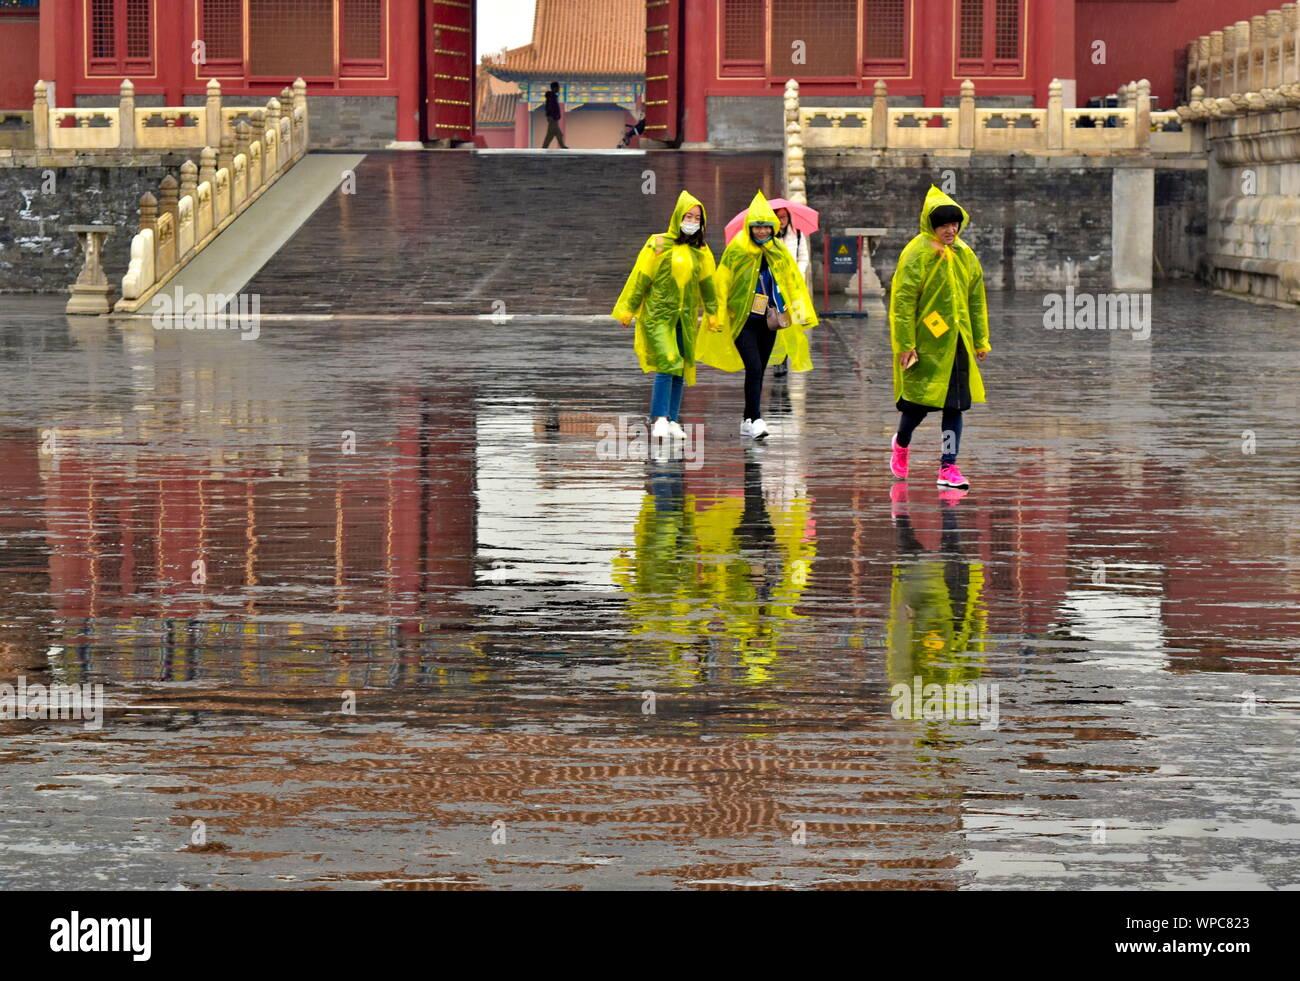 Hito de la arquitectura china Ciudad Prohibida palace gate agua reflejado en charcos, Beijing, China Foto de stock